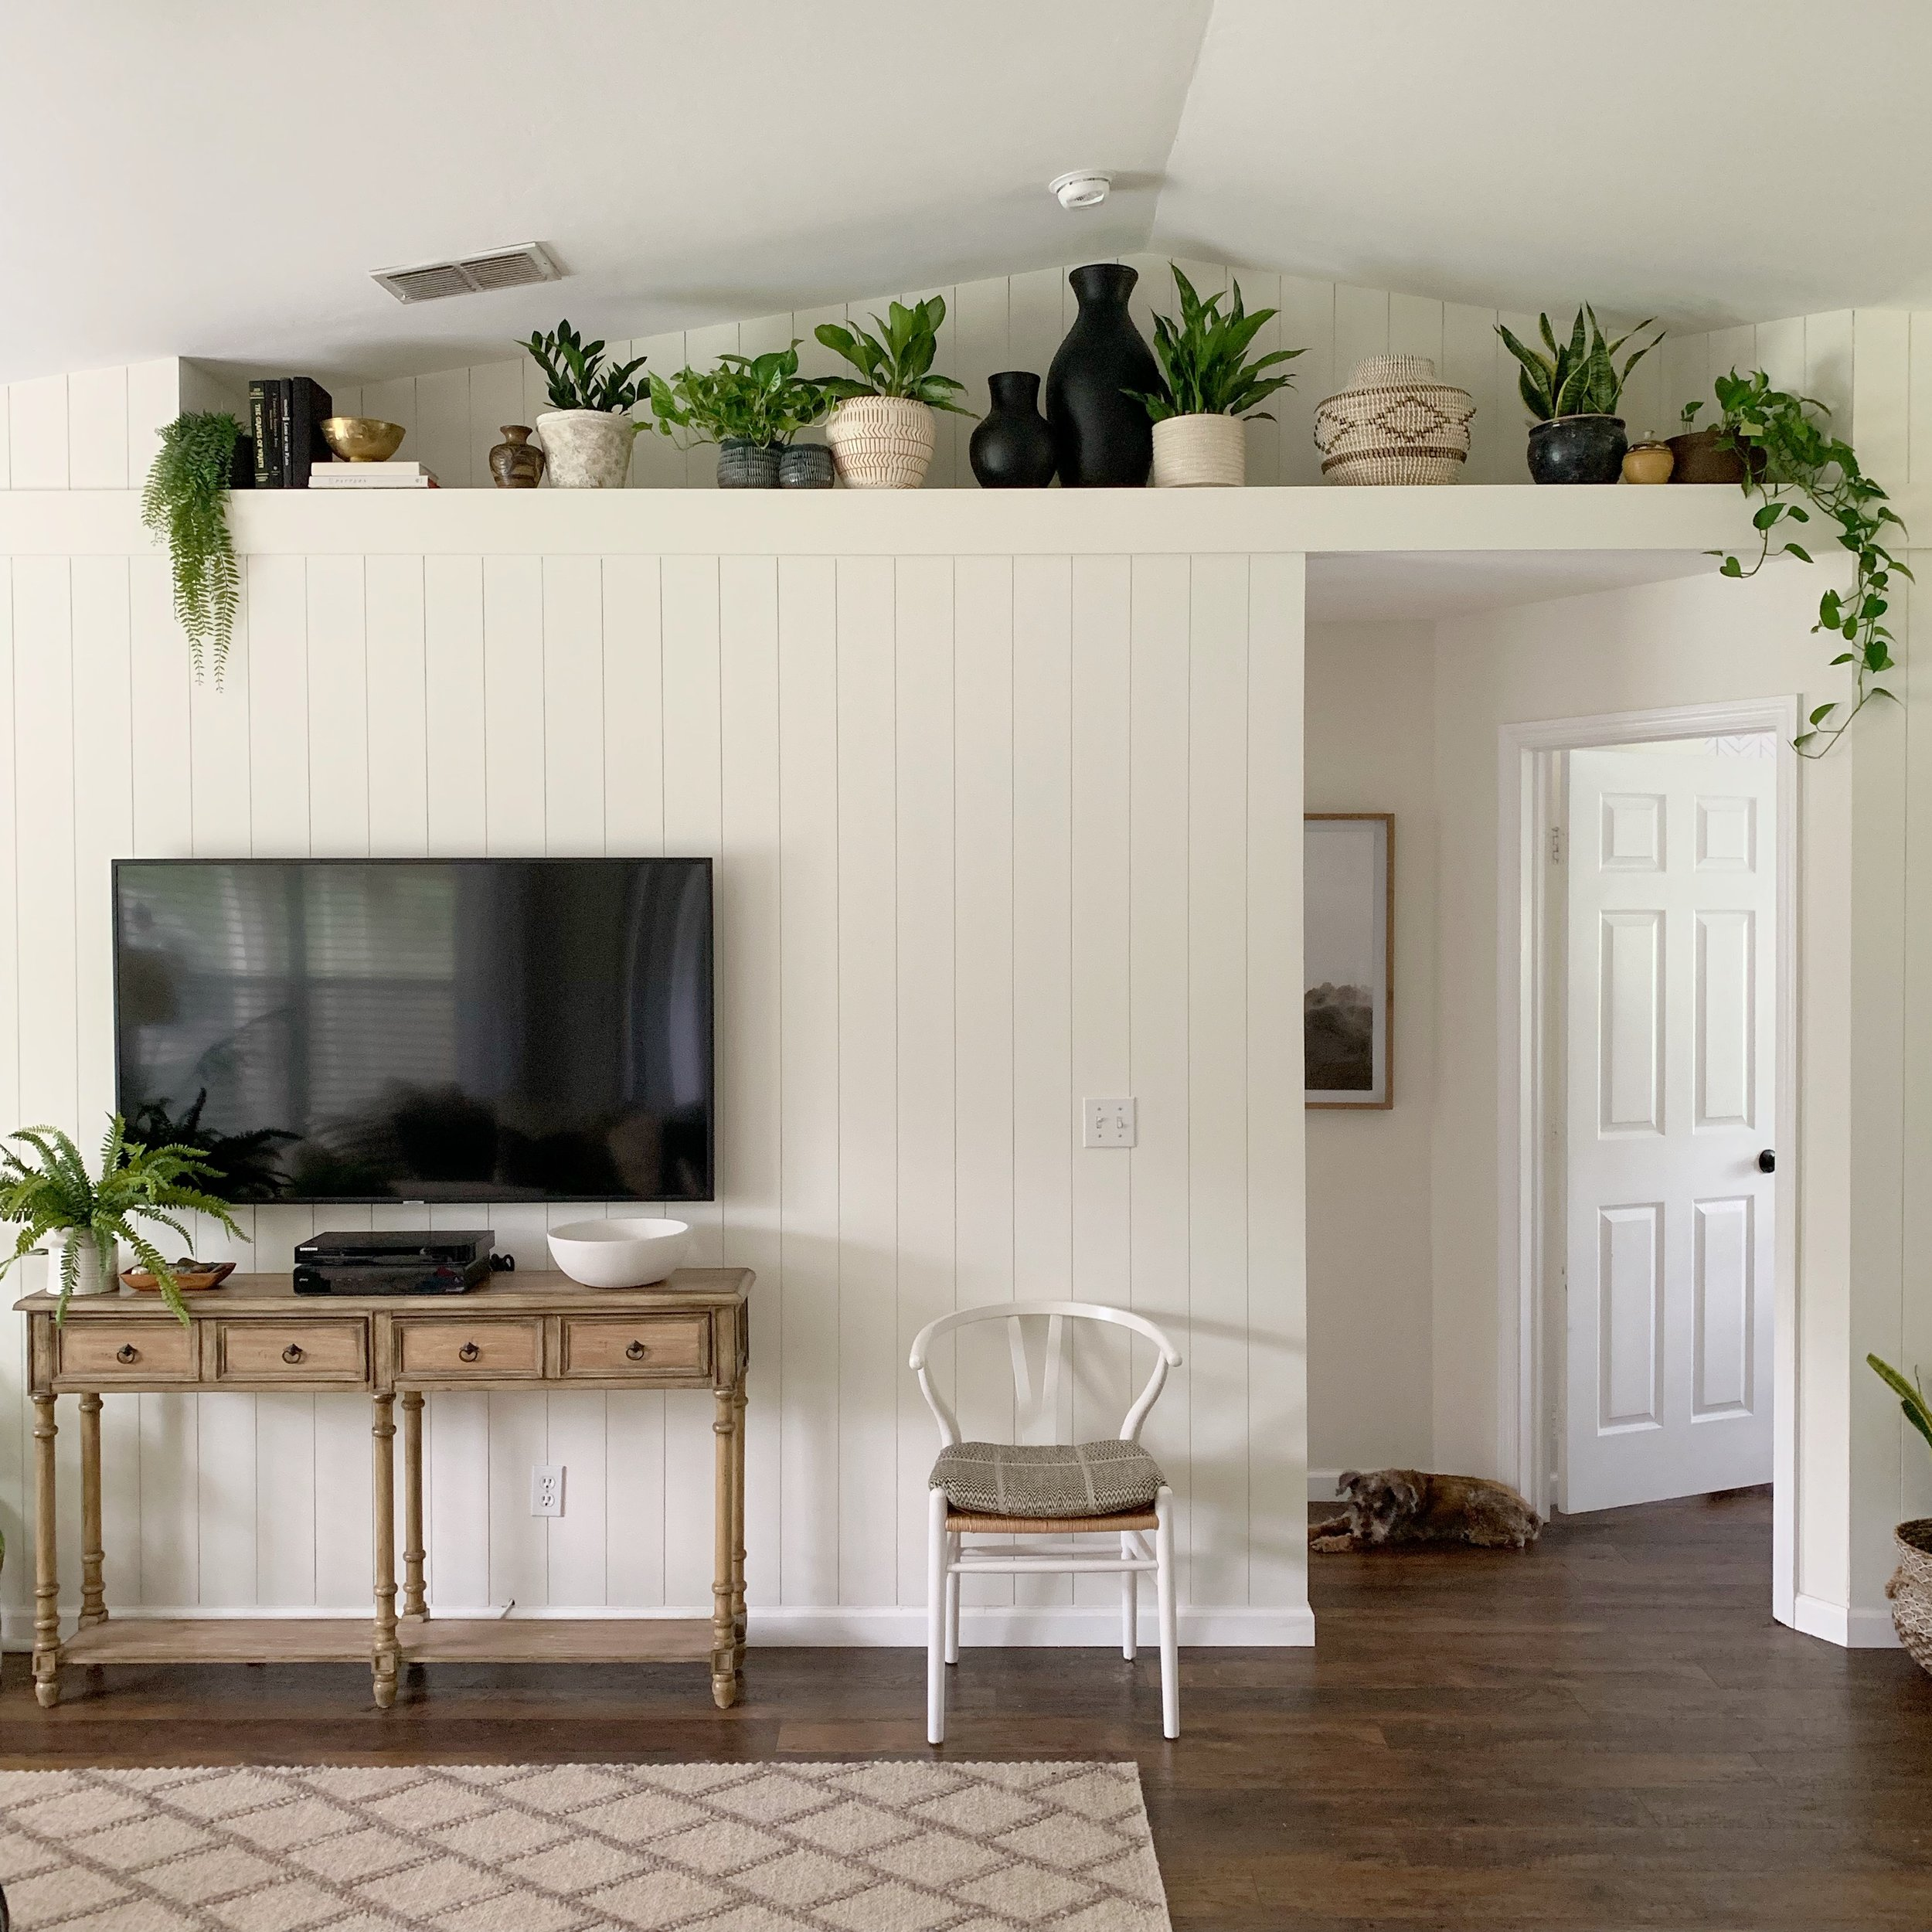 High shelf plant ledge